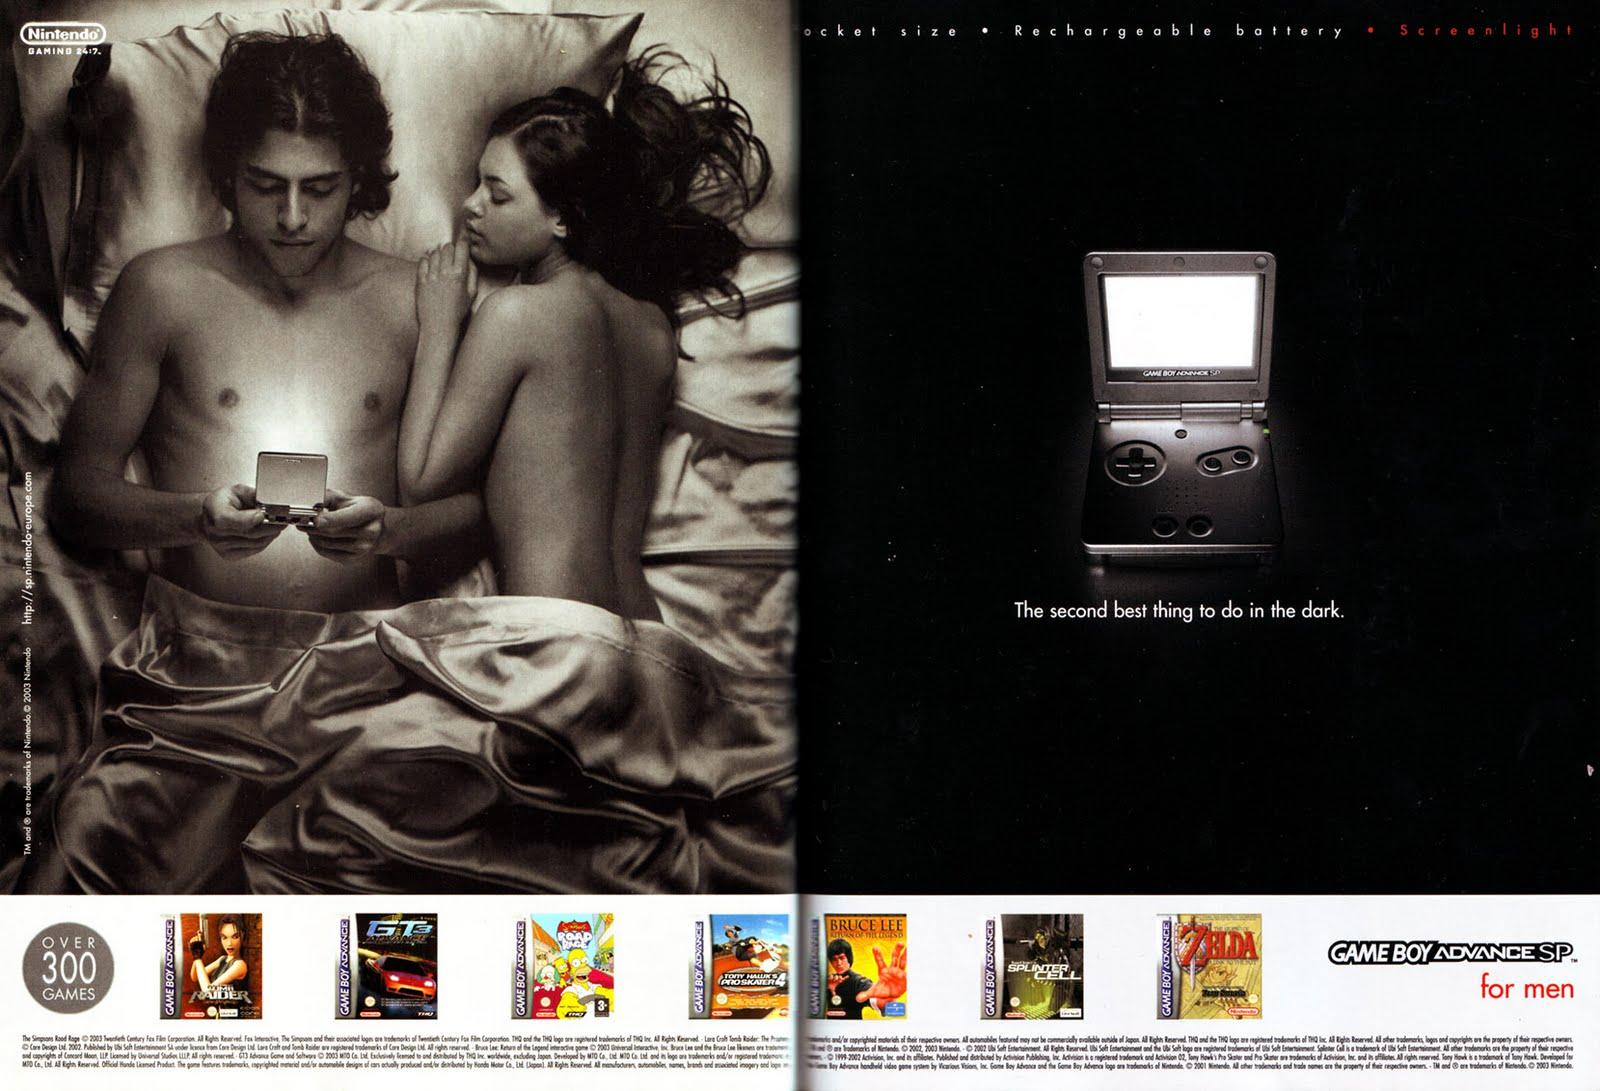 Sexy game ads